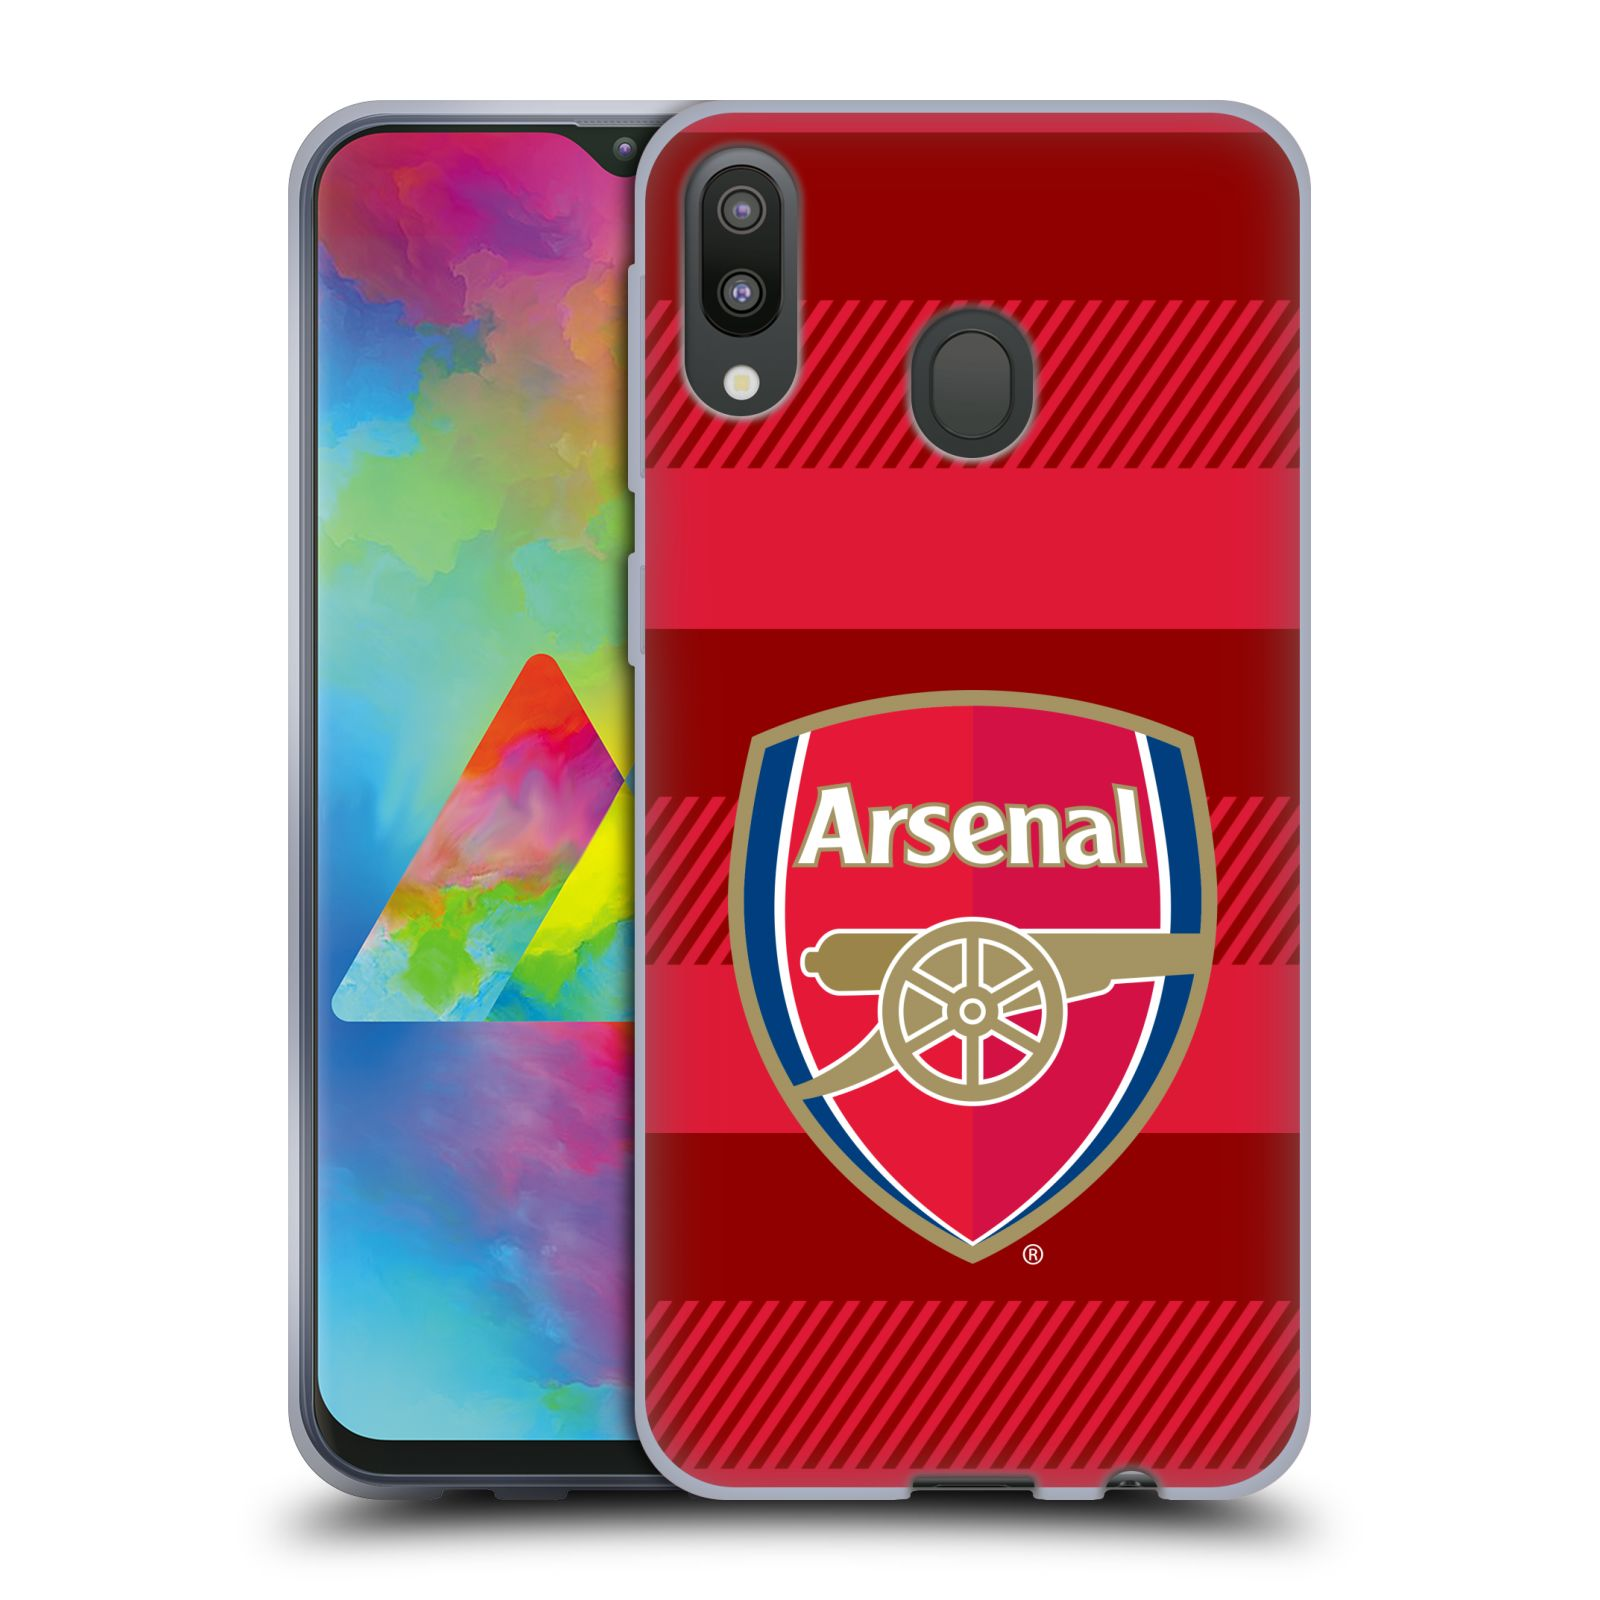 Silikonové pouzdro na mobil Samsung Galaxy M20 - Head Case - Arsenal FC - Logo s pruhy